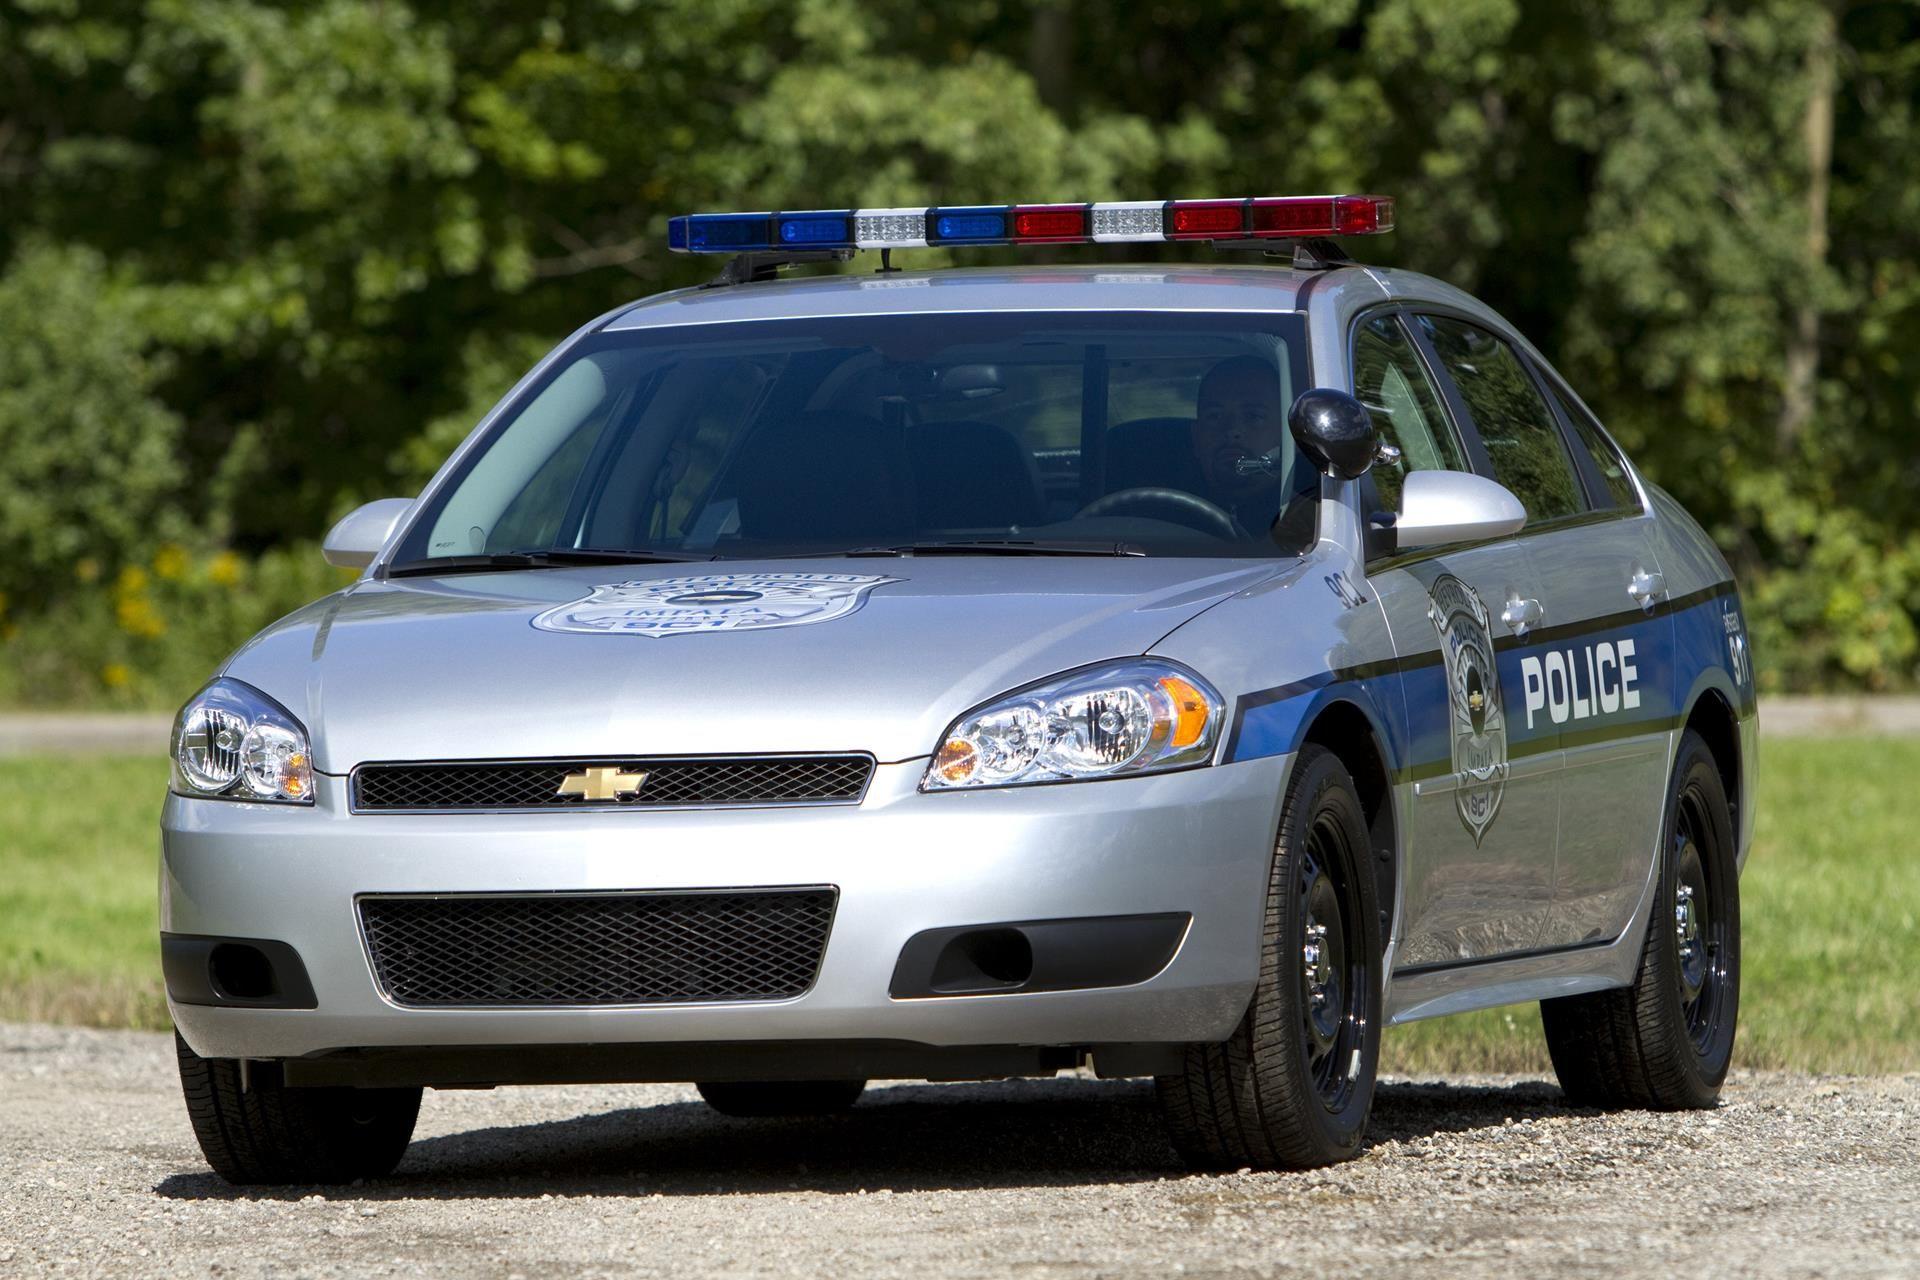 2020 Chevrolet Impala Police 2020 Chevrolet Impala Police 2012